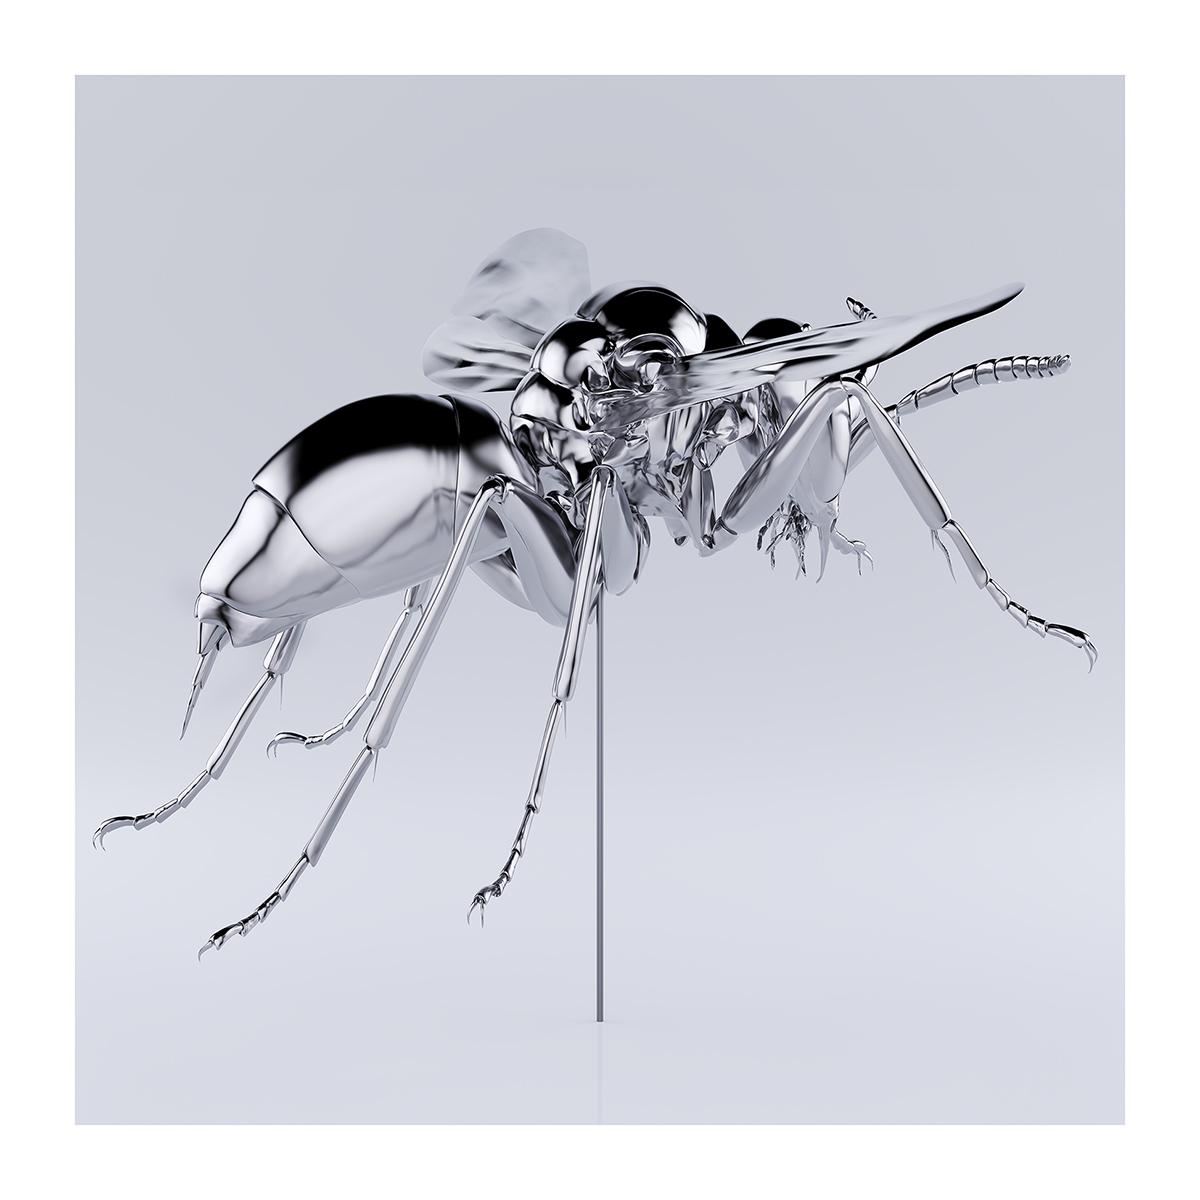 These were the Insects 004 1 - 2020 - These were the Insects